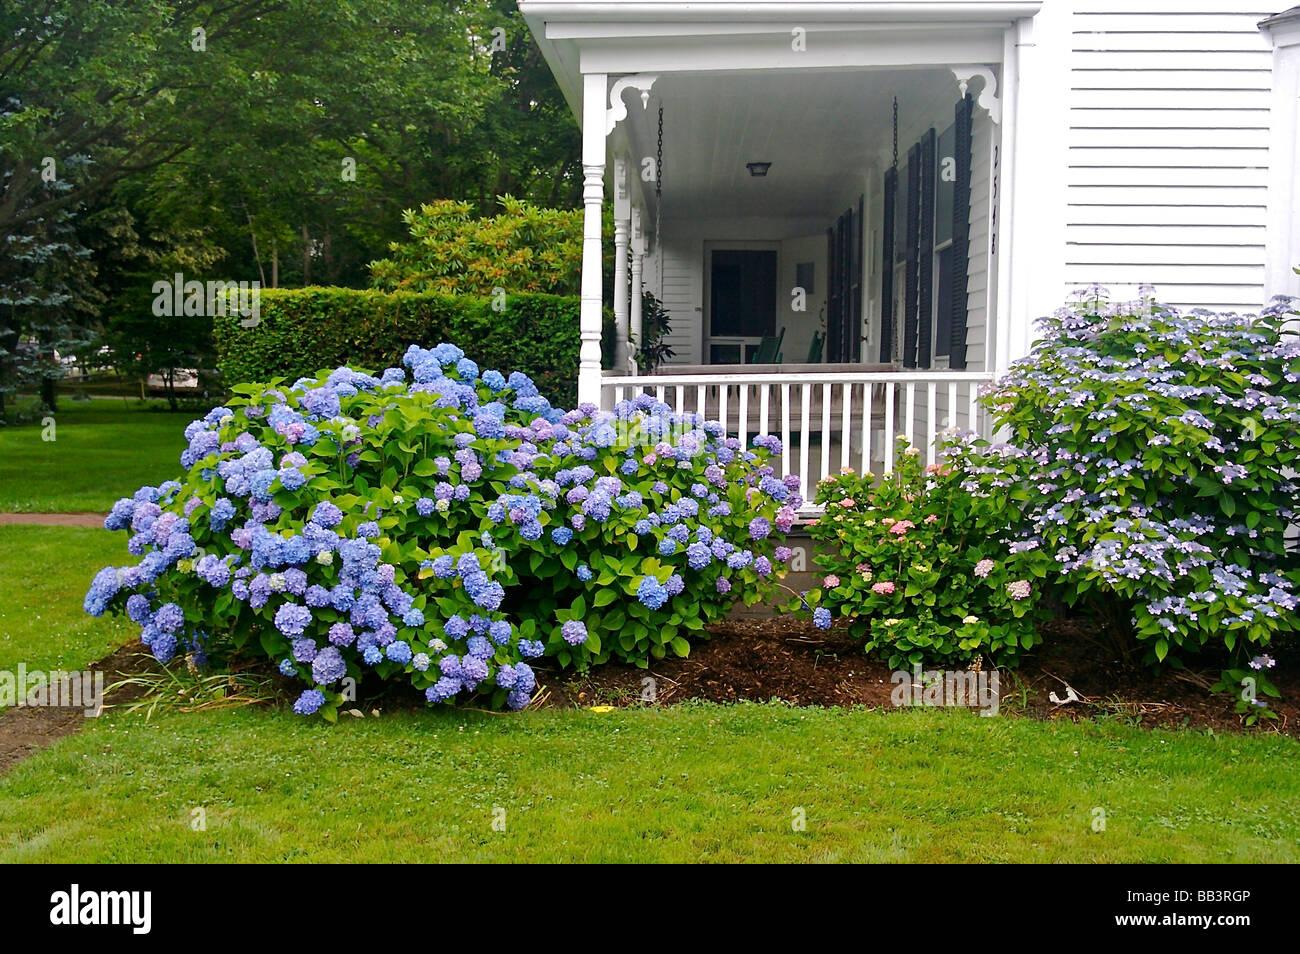 North America Usa Massachusetts Brewster Flowers Surround The